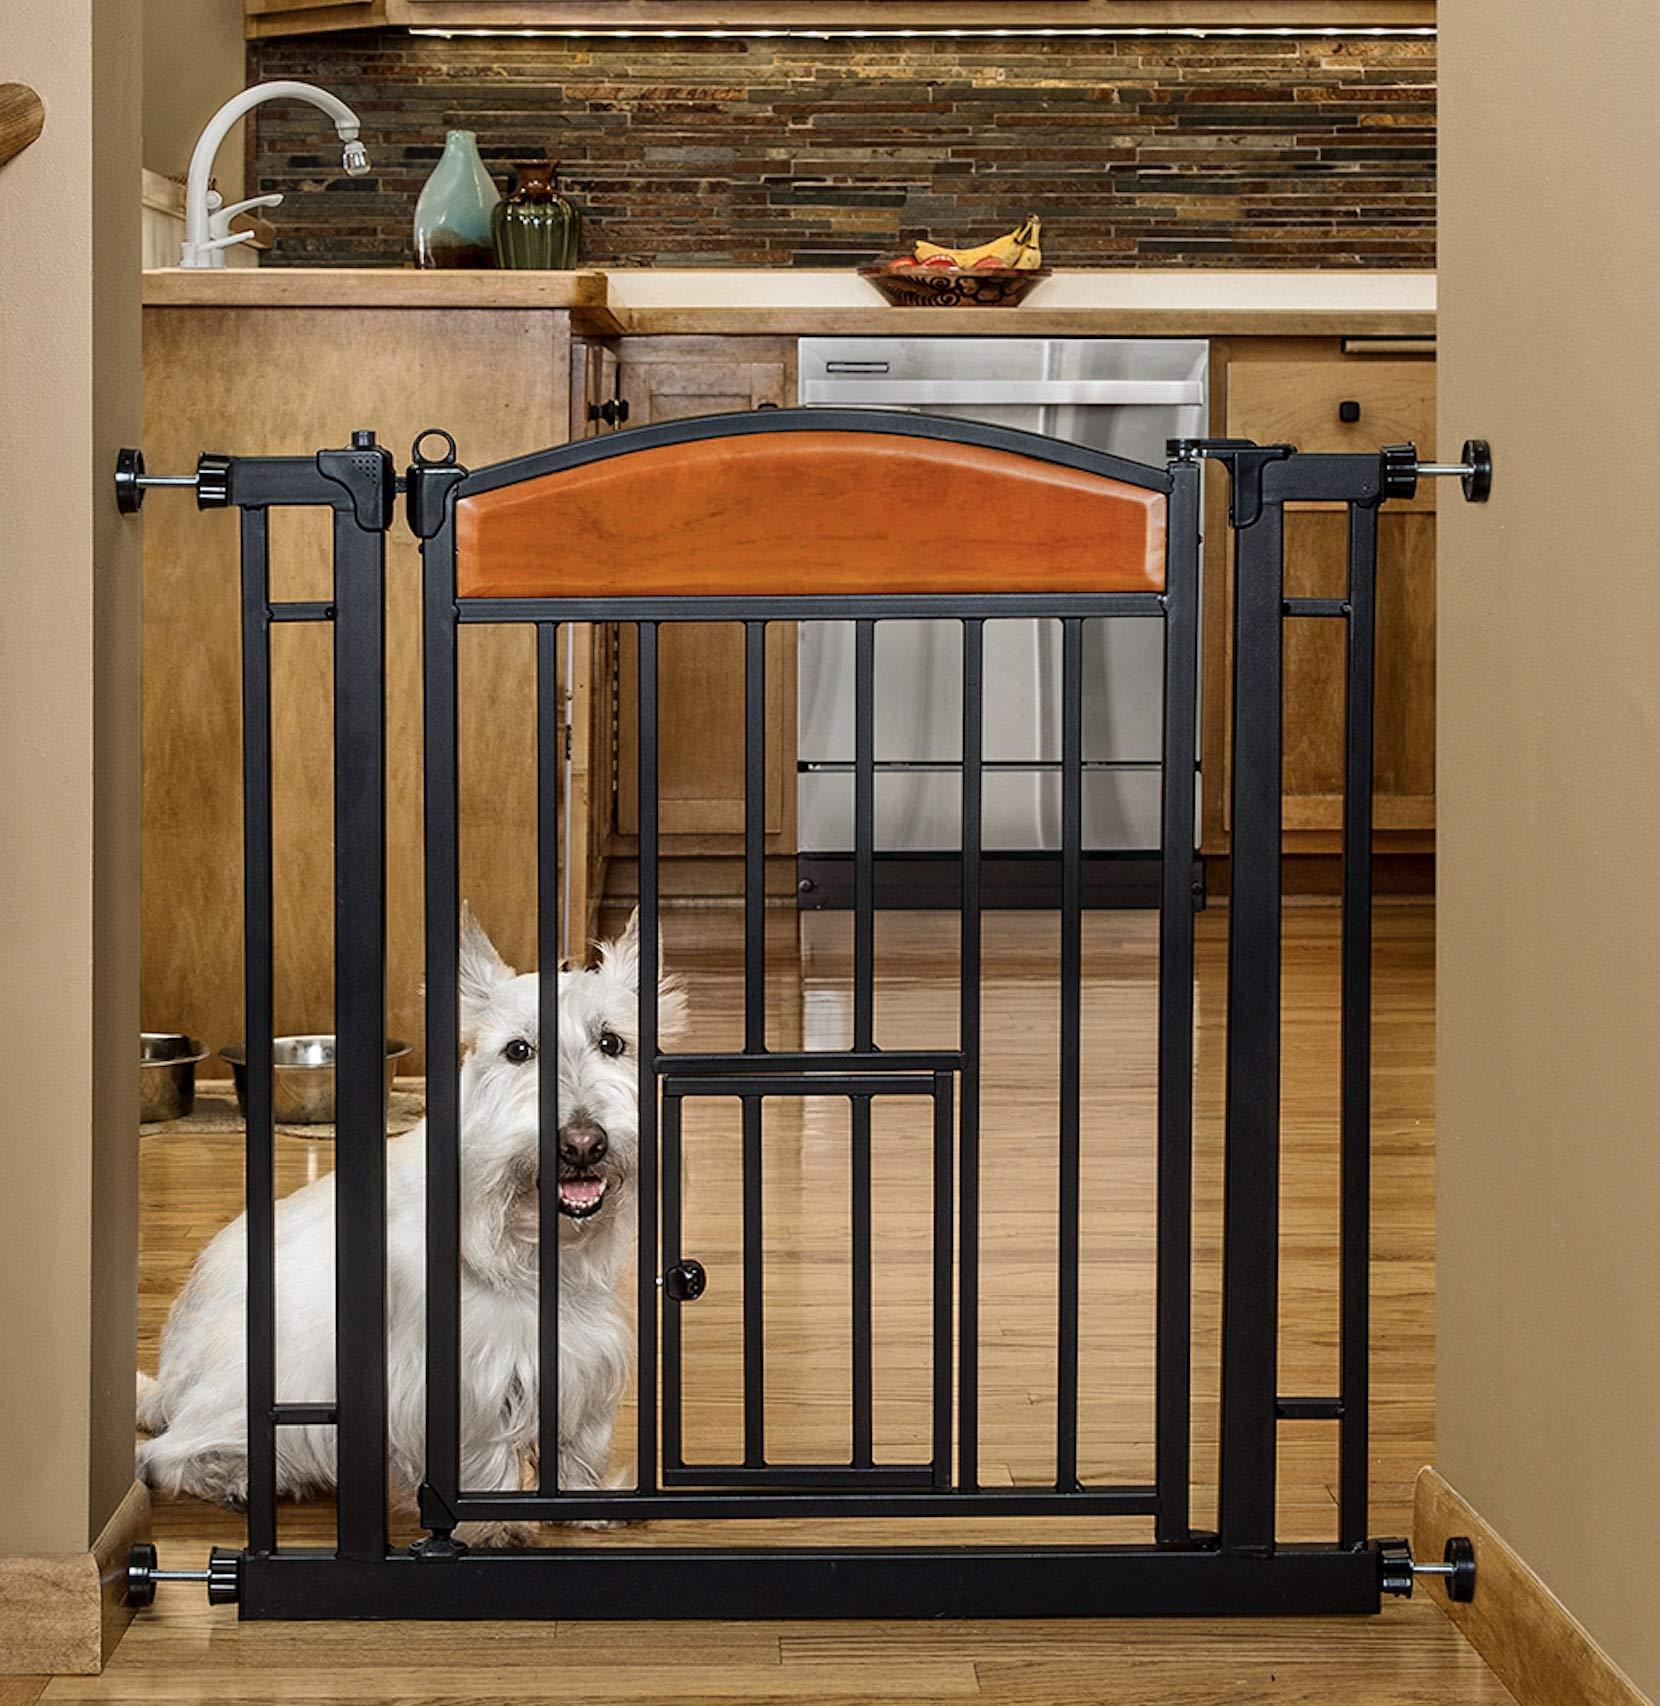 Carlson Pet Products Design Studio Home Decor Walk Through Pet Gate by Carlson Pet Products